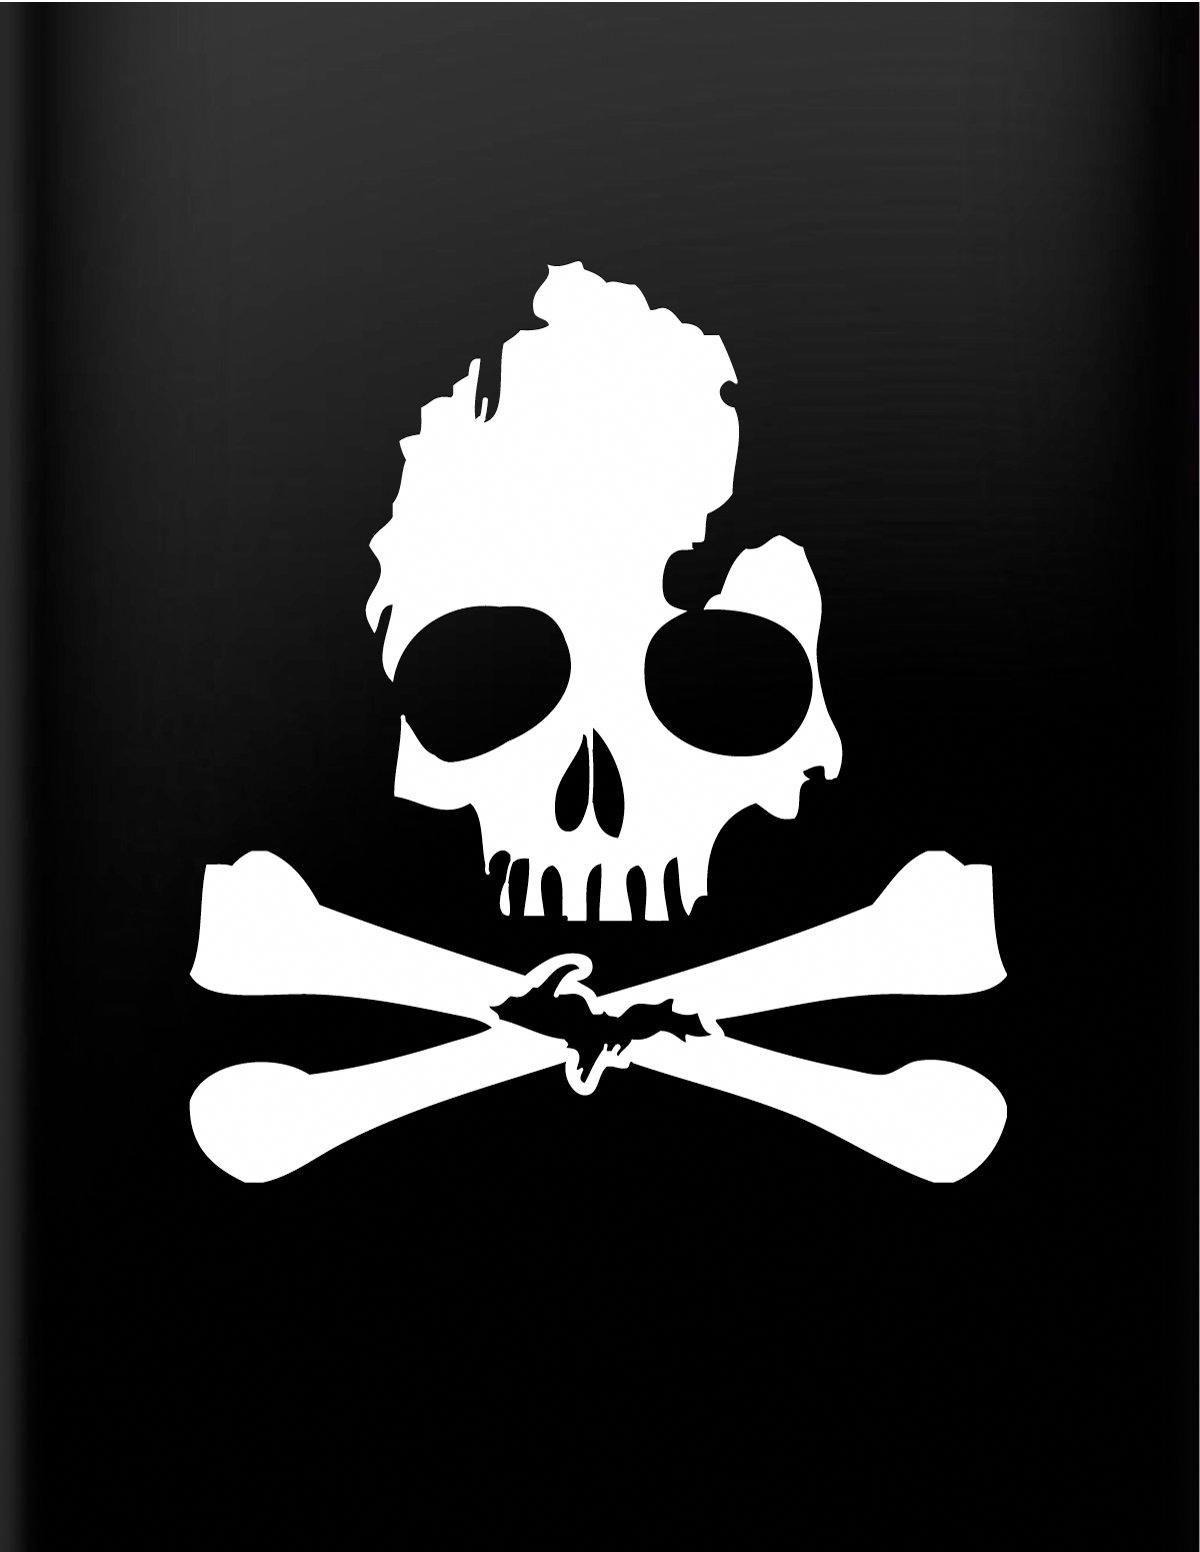 Michigan Skull Bones Decal Toyotaclassiccars Michigan Decal Skull Decal Vinyl Decals [ 1552 x 1200 Pixel ]